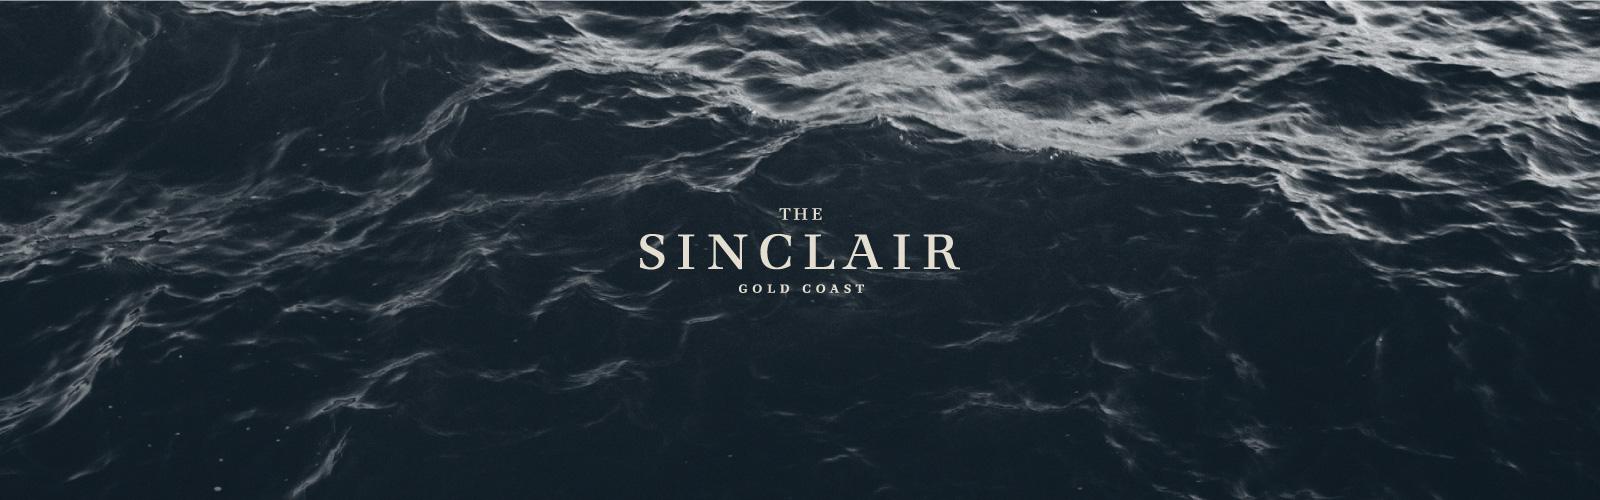 sinclair_logo_wave_01.jpg